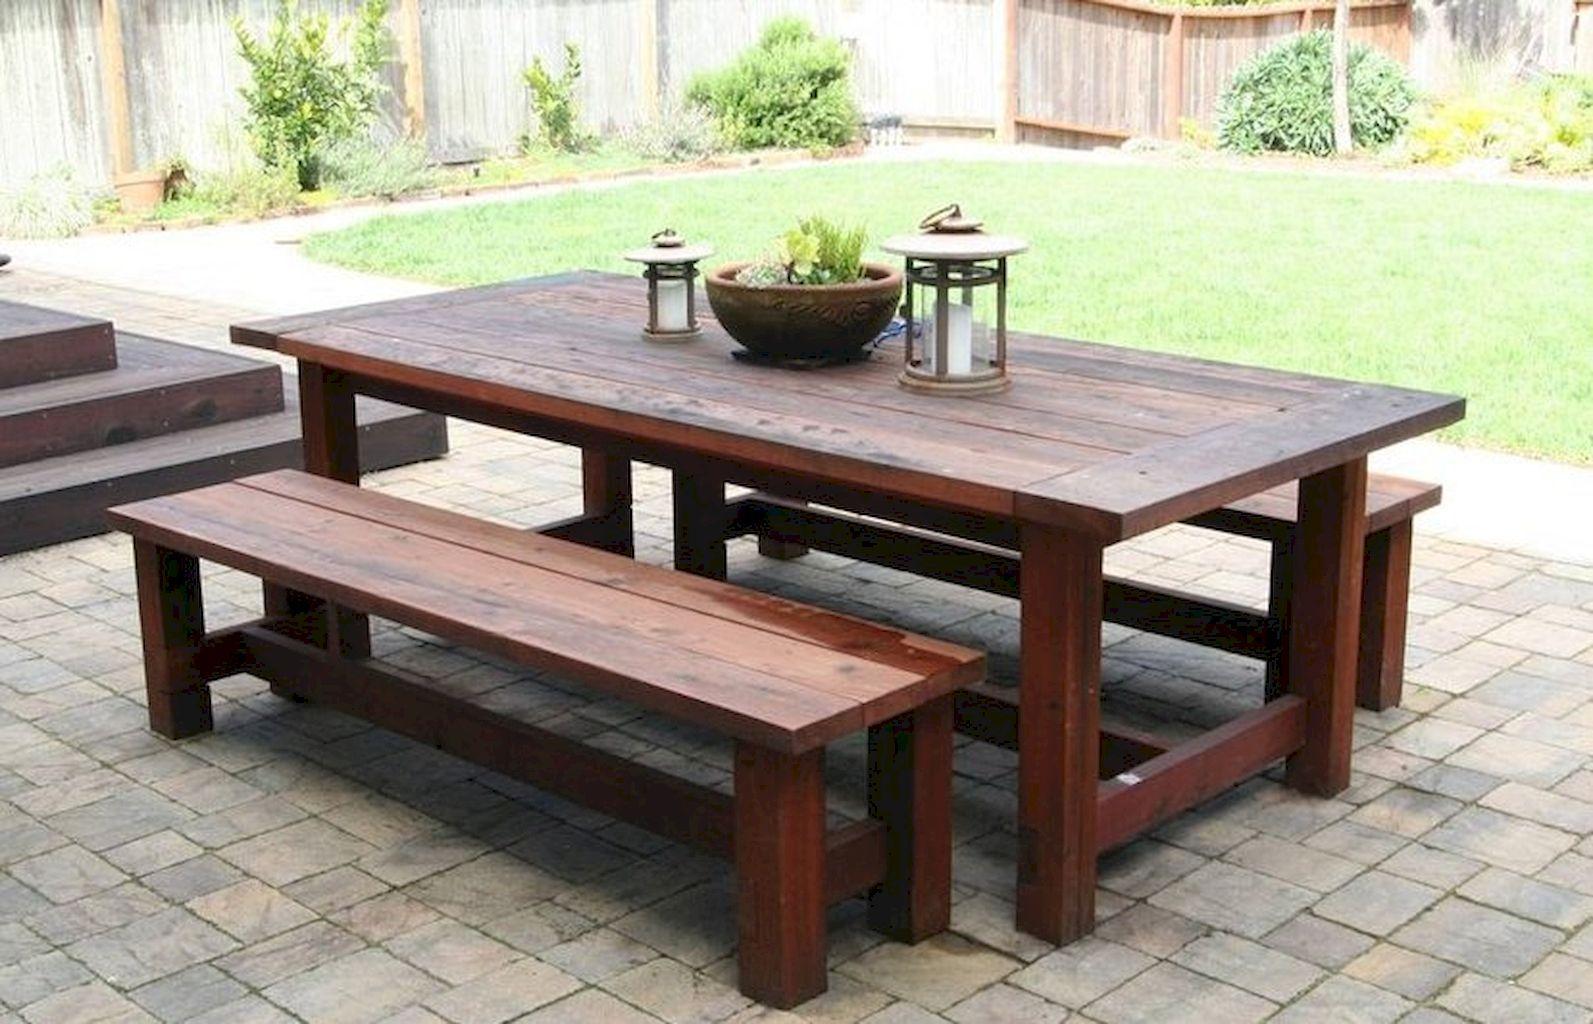 farmhouse patio table with bench